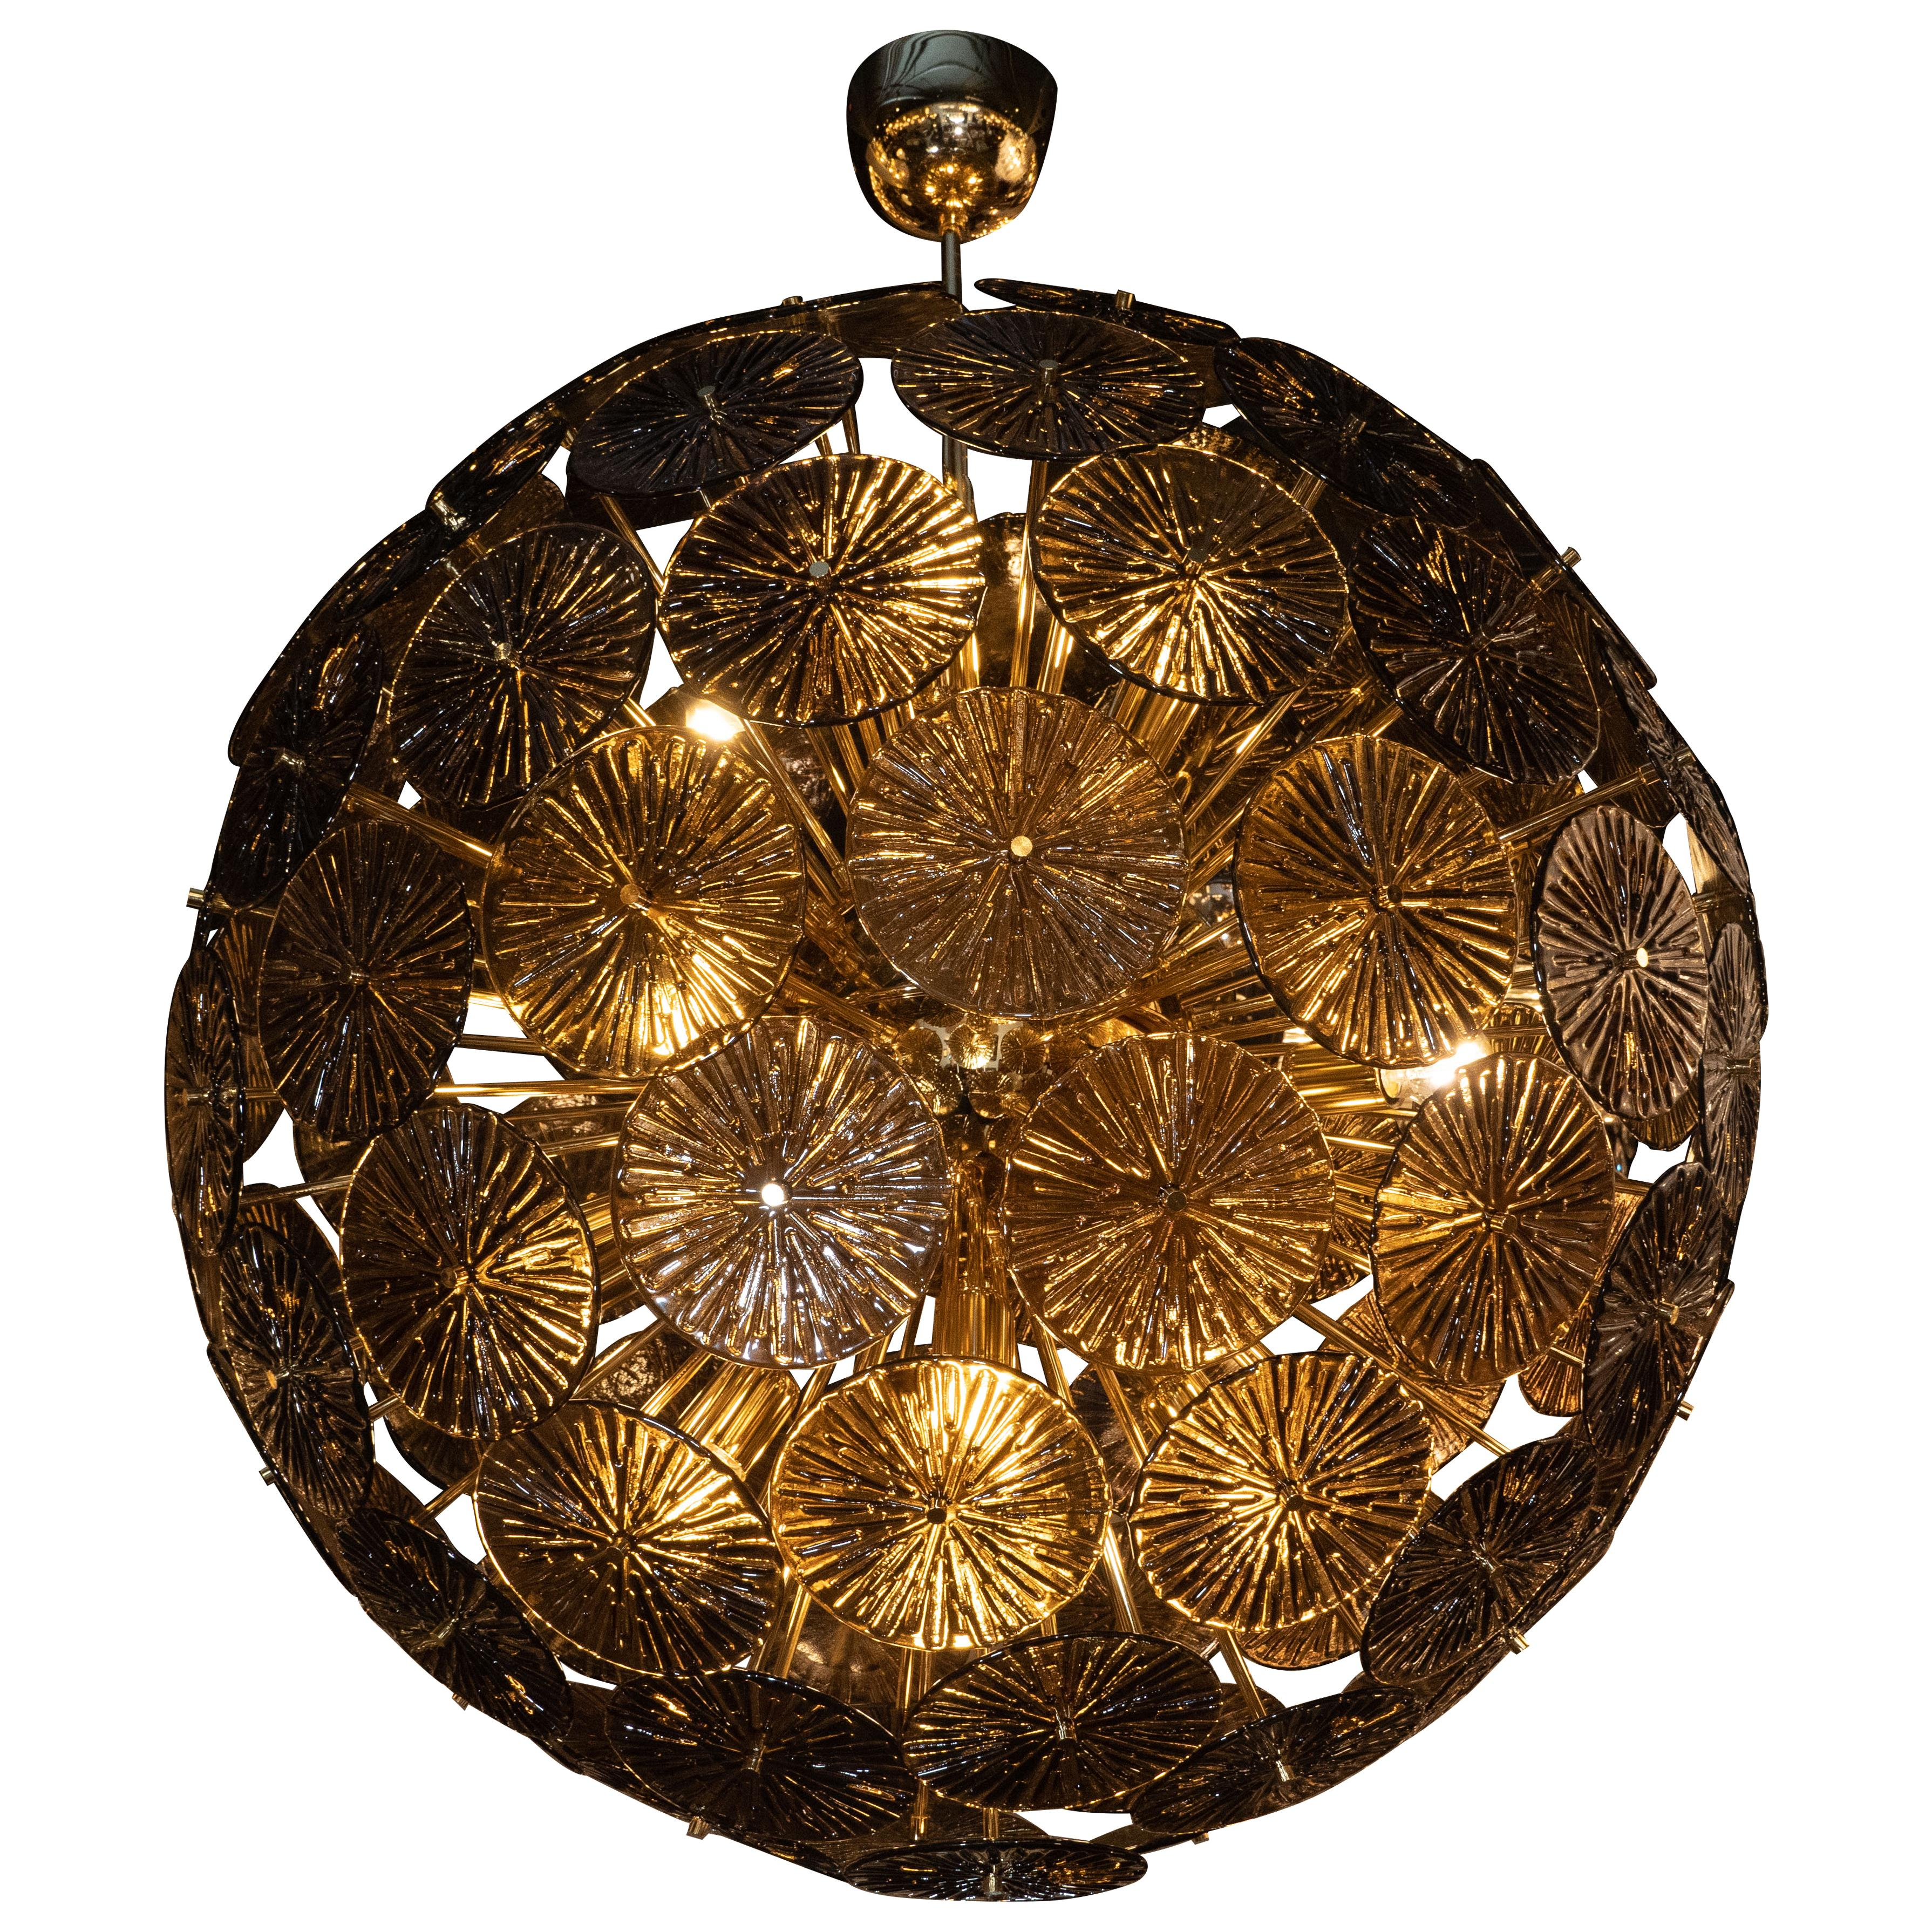 Modernist Handblown Murano Smoked Bronze Glass and Polished Brass Sputnik